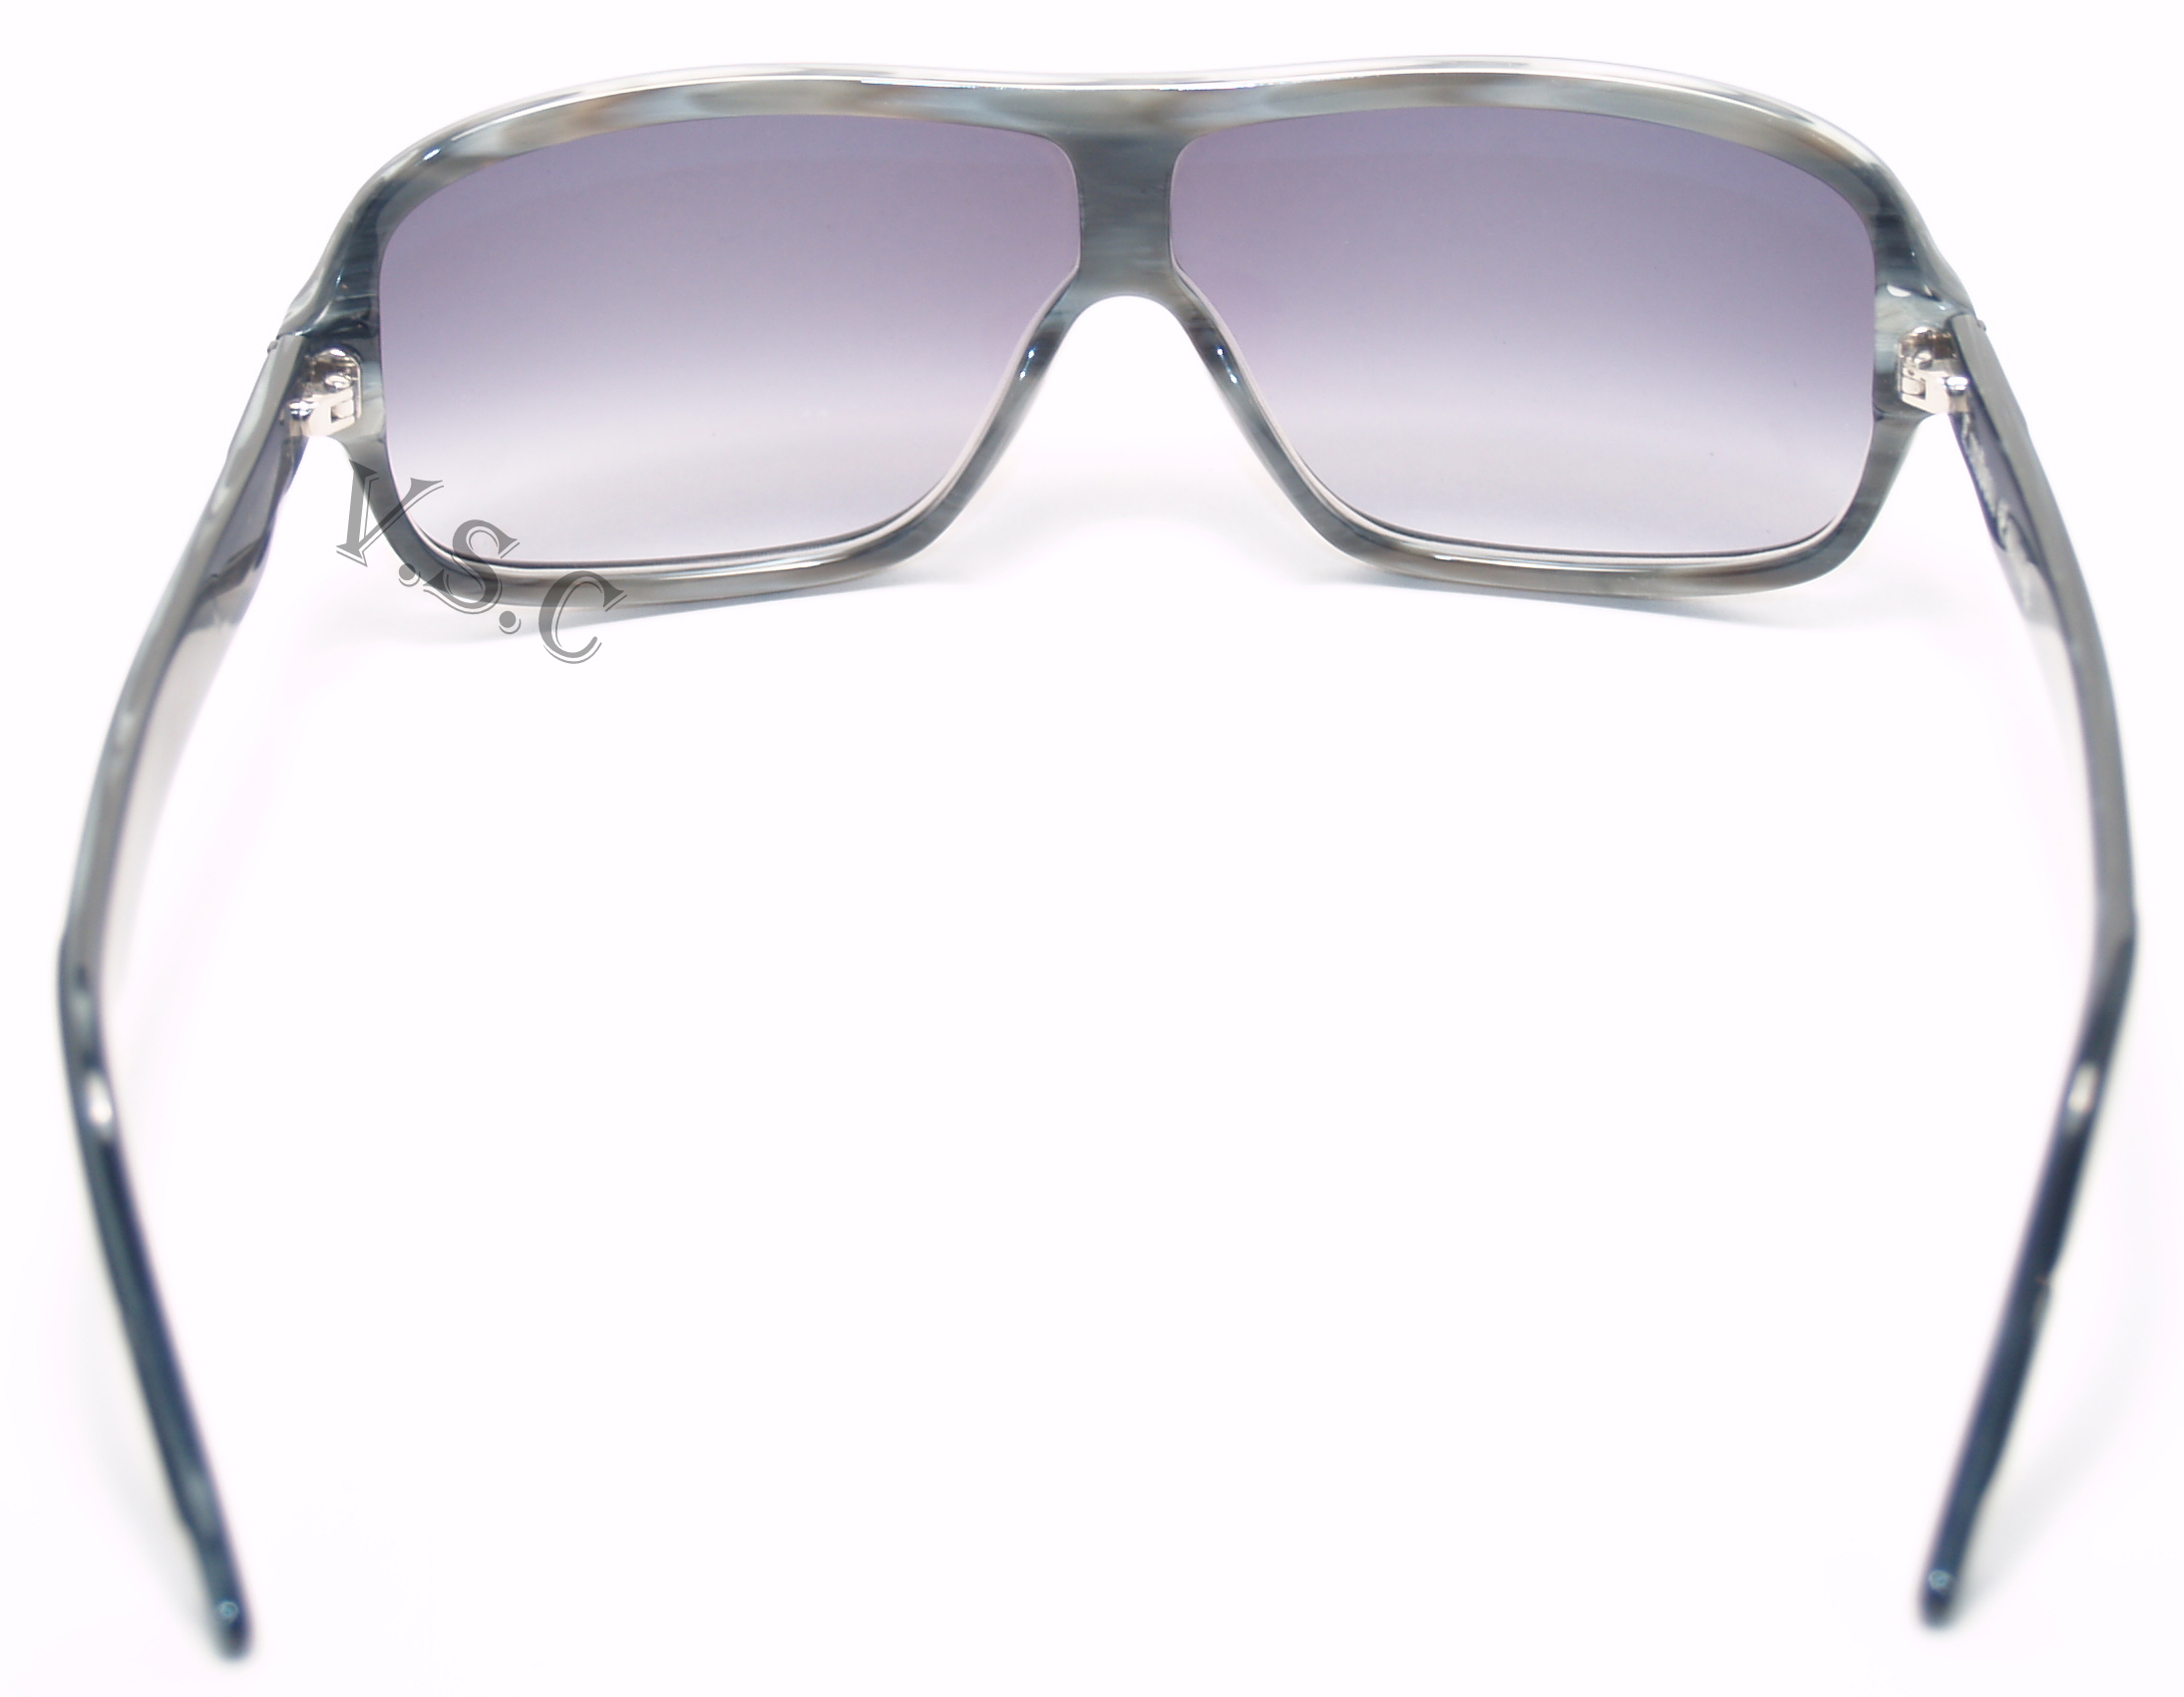 Initium London Calling Iron Man 3 Sunglasses Tony Stark Movie Sun Glasses New BK